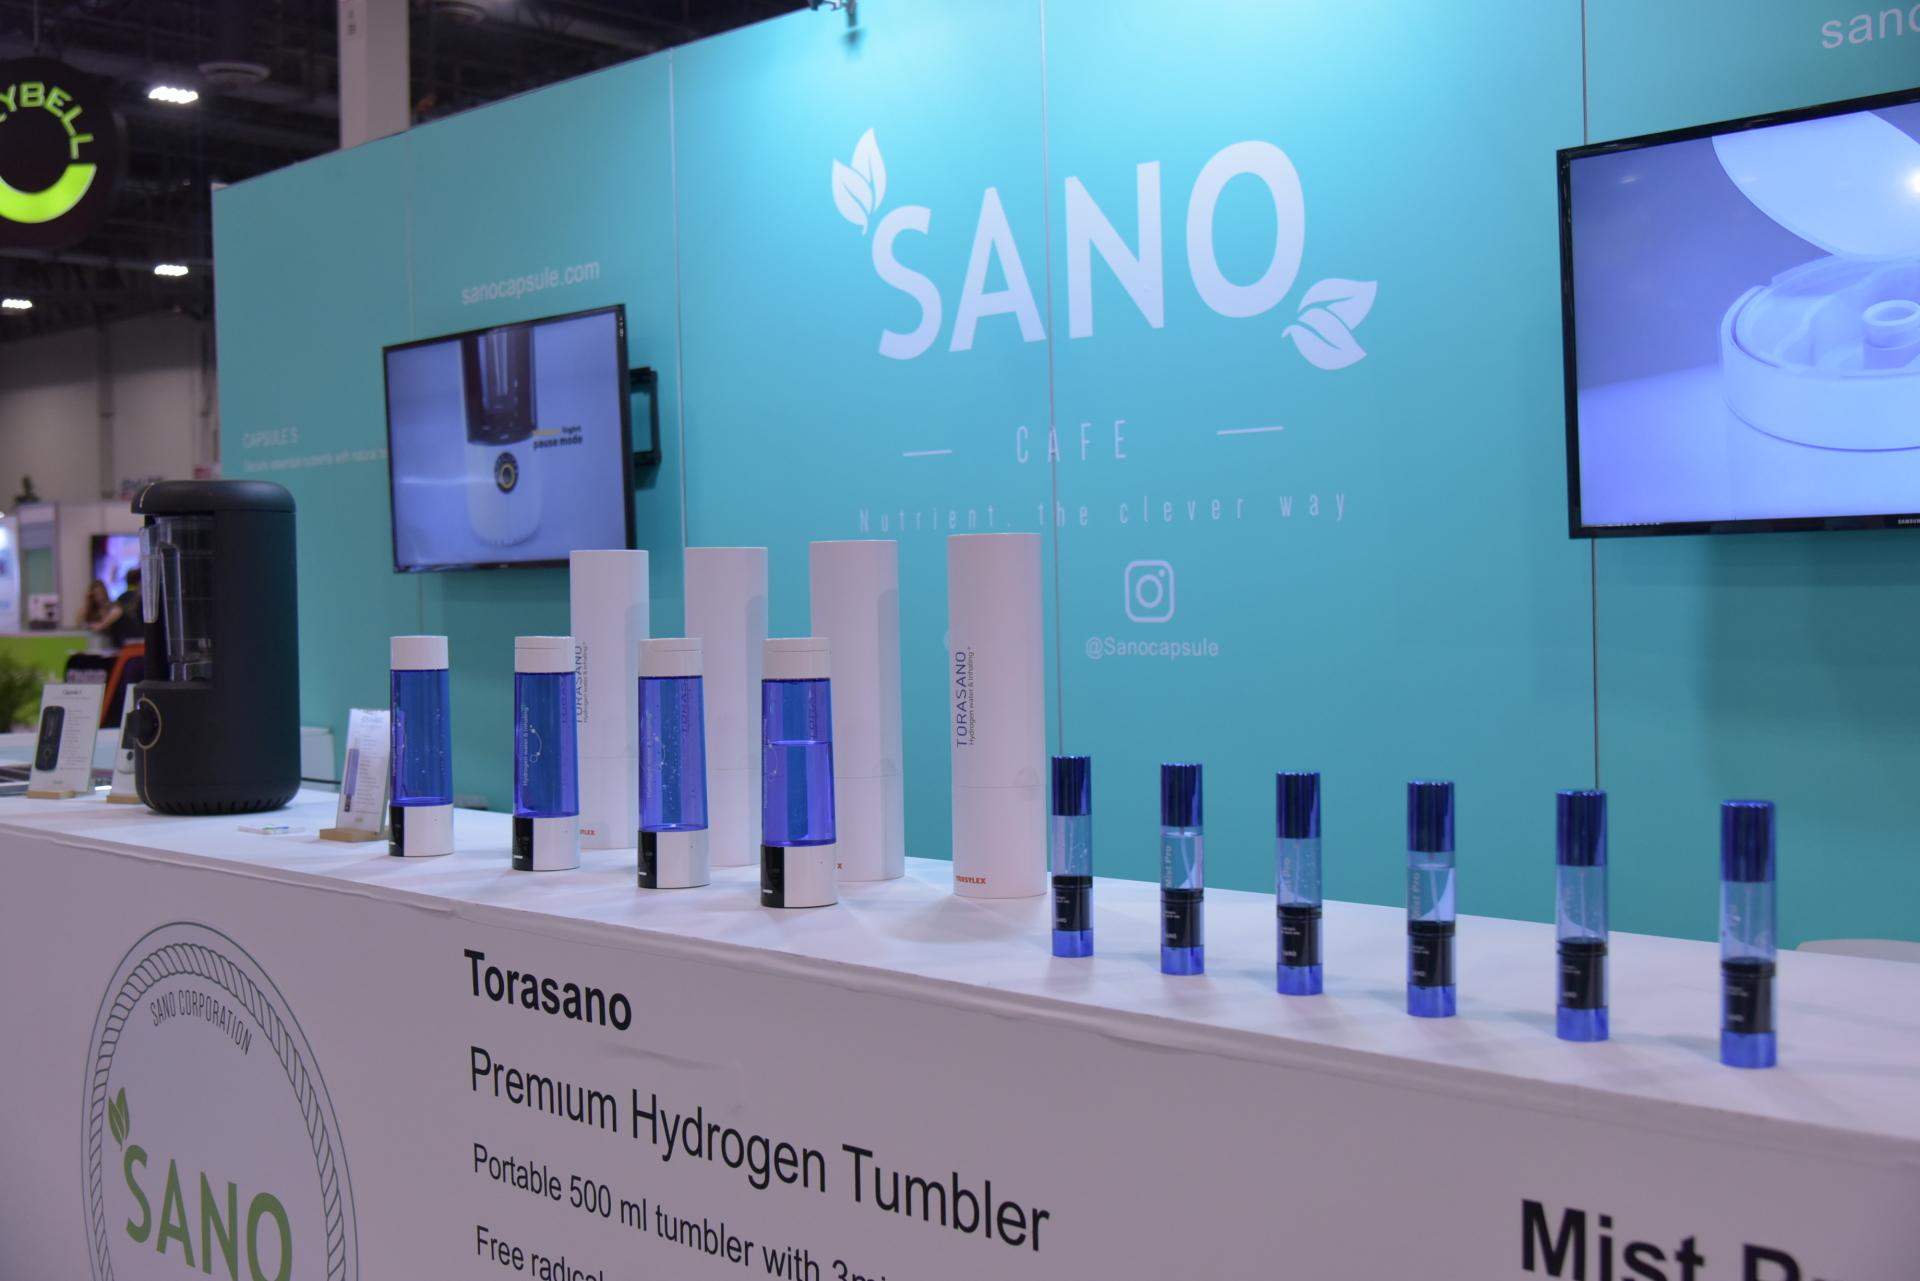 SANO Product line